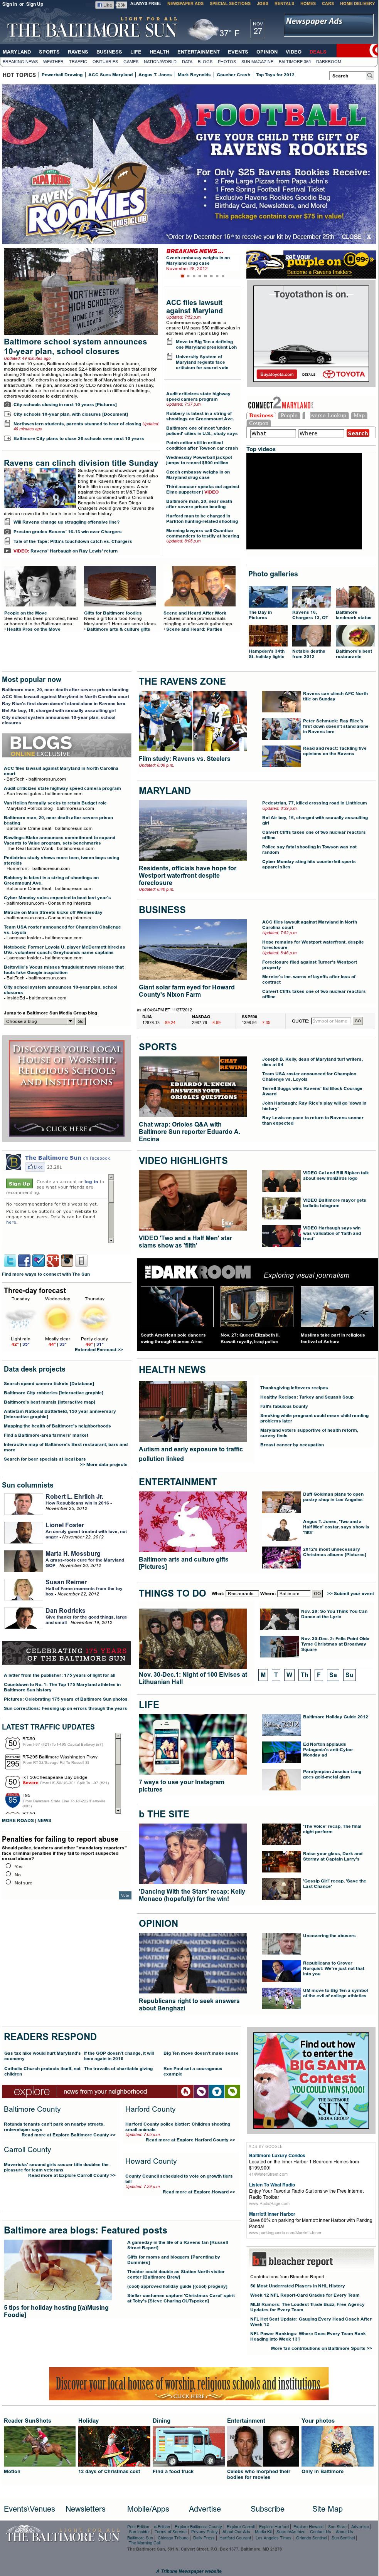 The Baltimore Sun at Wednesday Nov. 28, 2012, 3:02 a.m. UTC